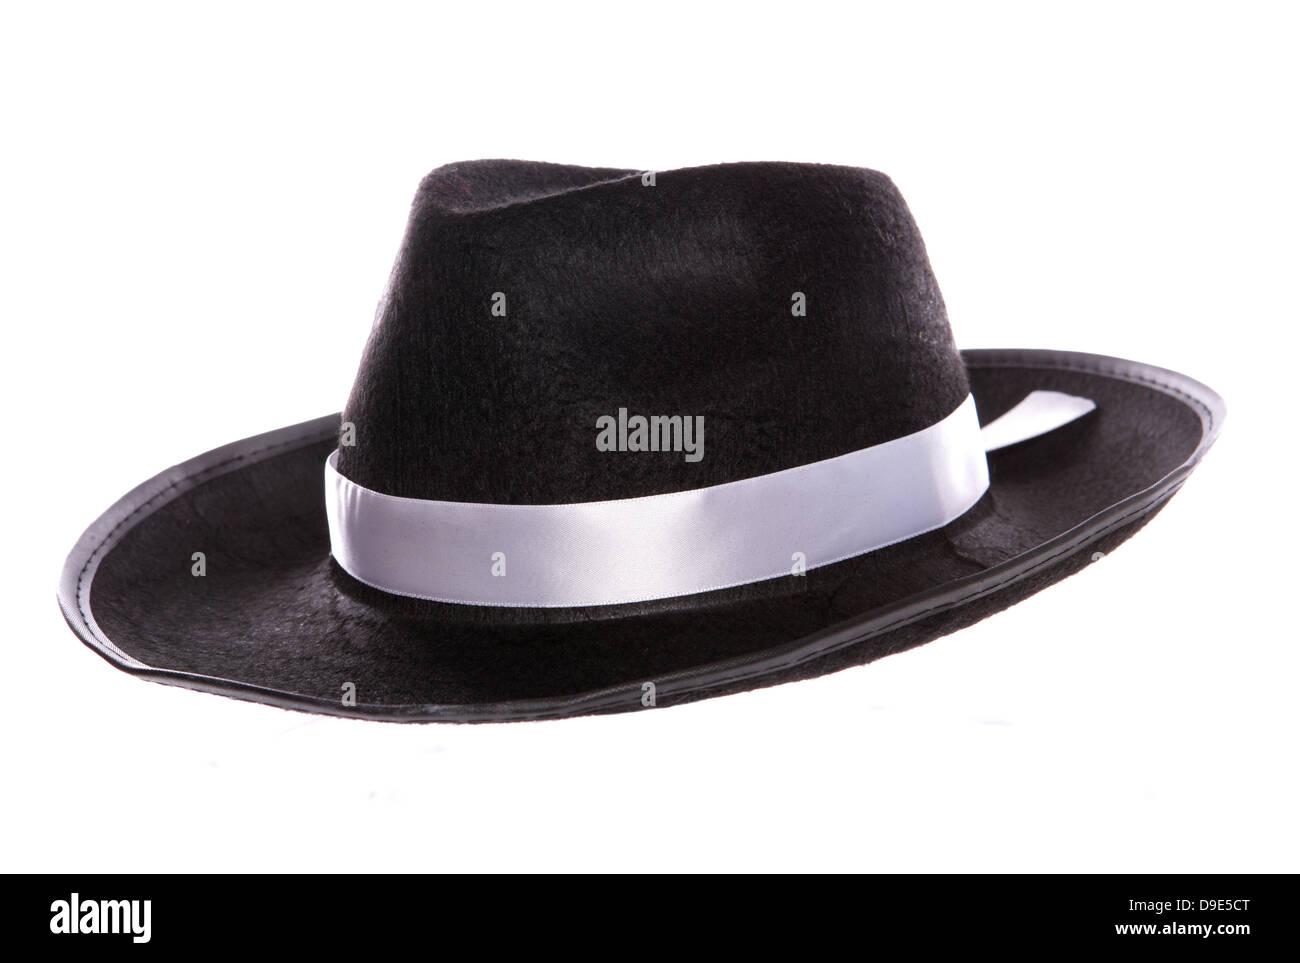 black mafia hat - Stock Image